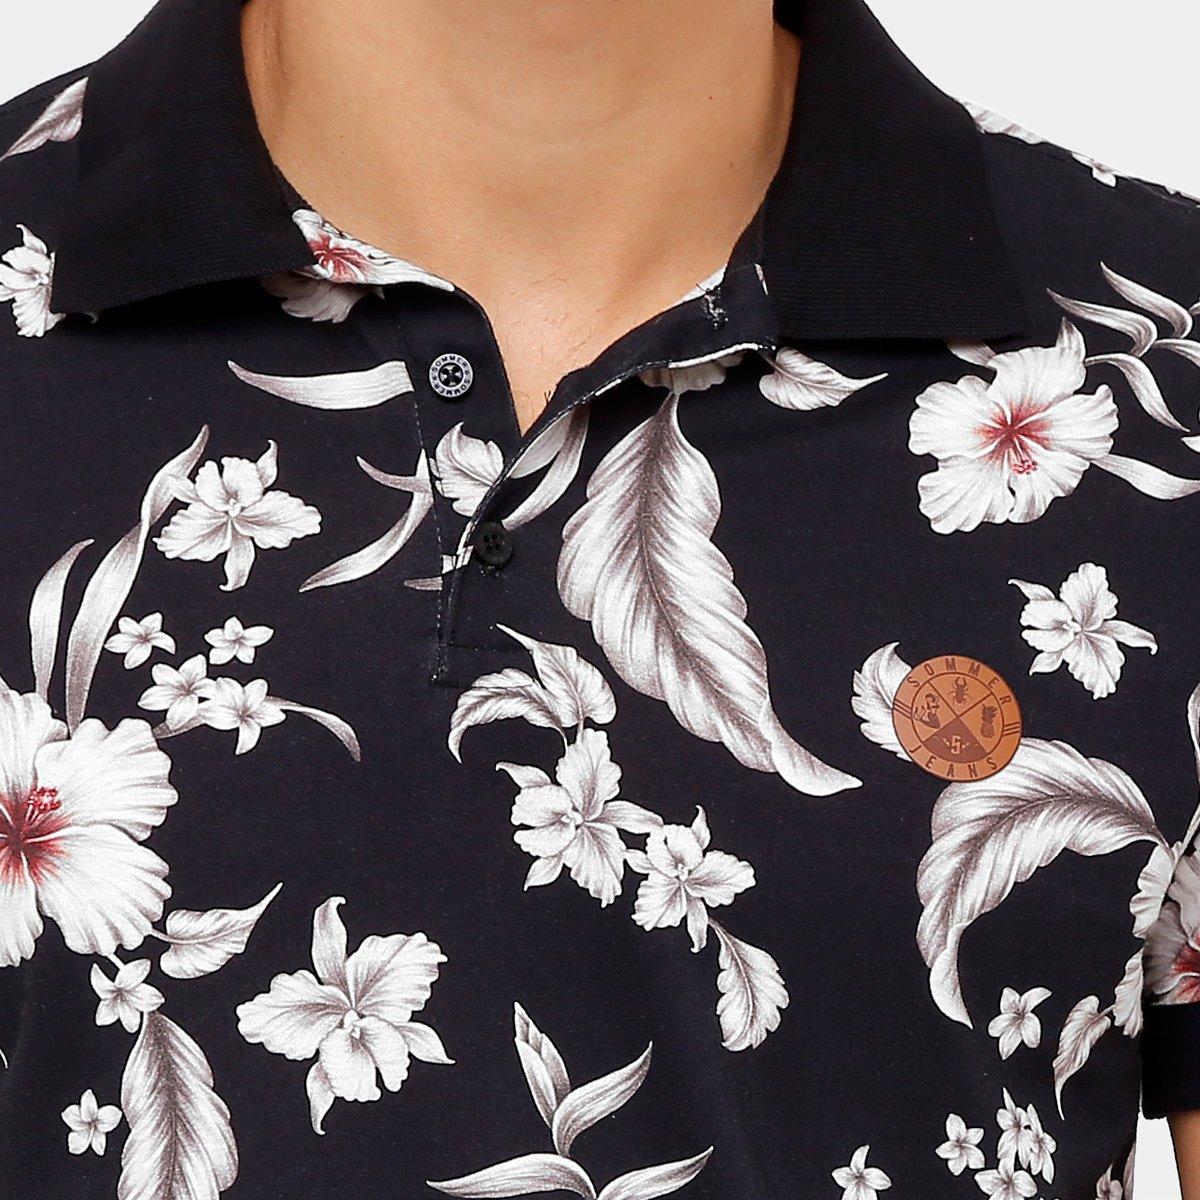 f6c16c3eb8 Camisa Polo Sommer Malha Full Print Flower Degradê Masculina ...